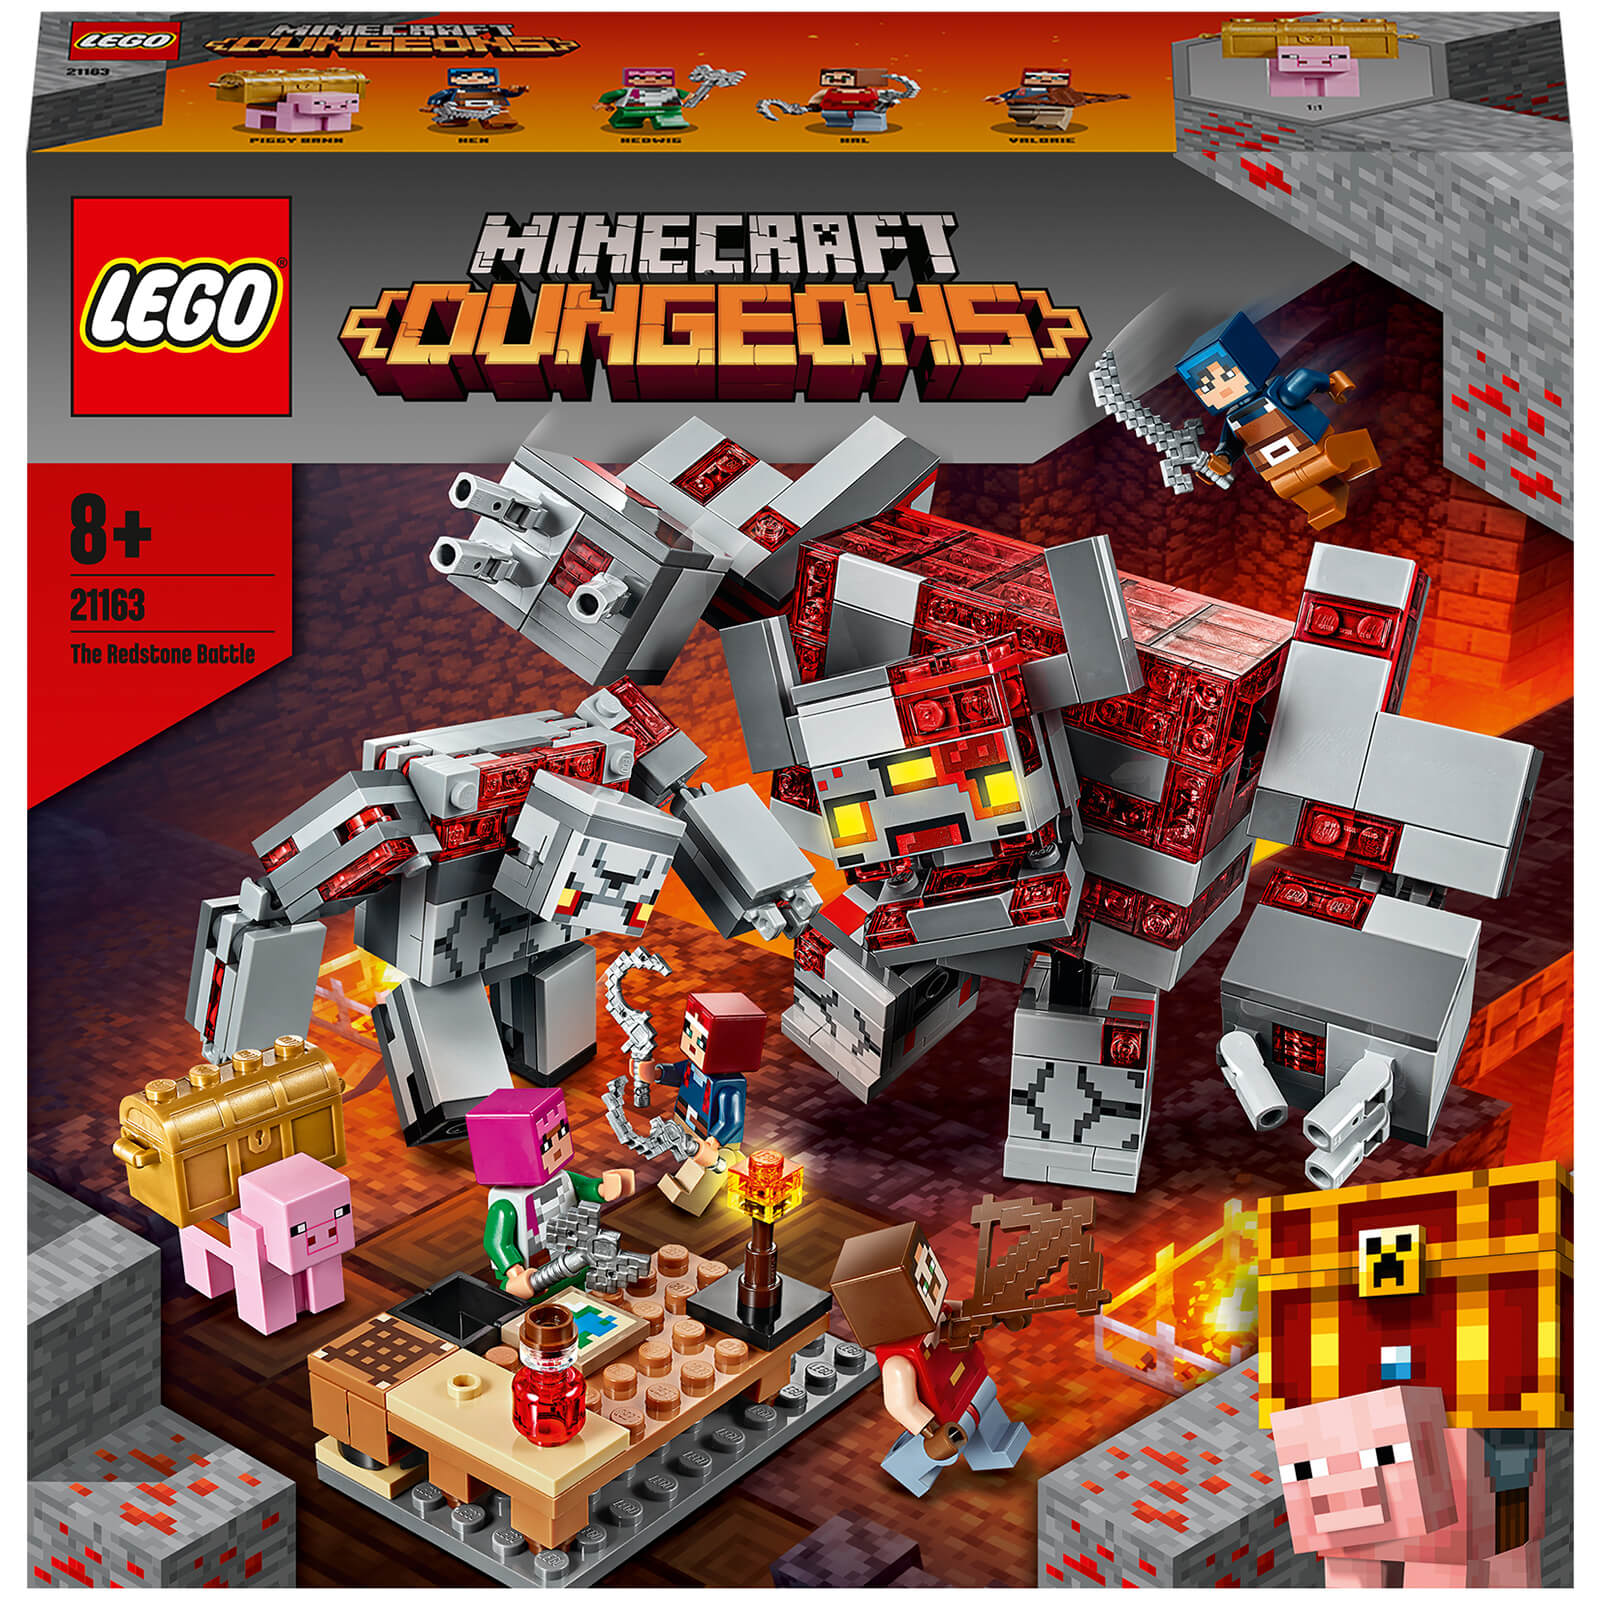 Image of LEGO Minecraft: The Redstone Battle Building Set (21163)